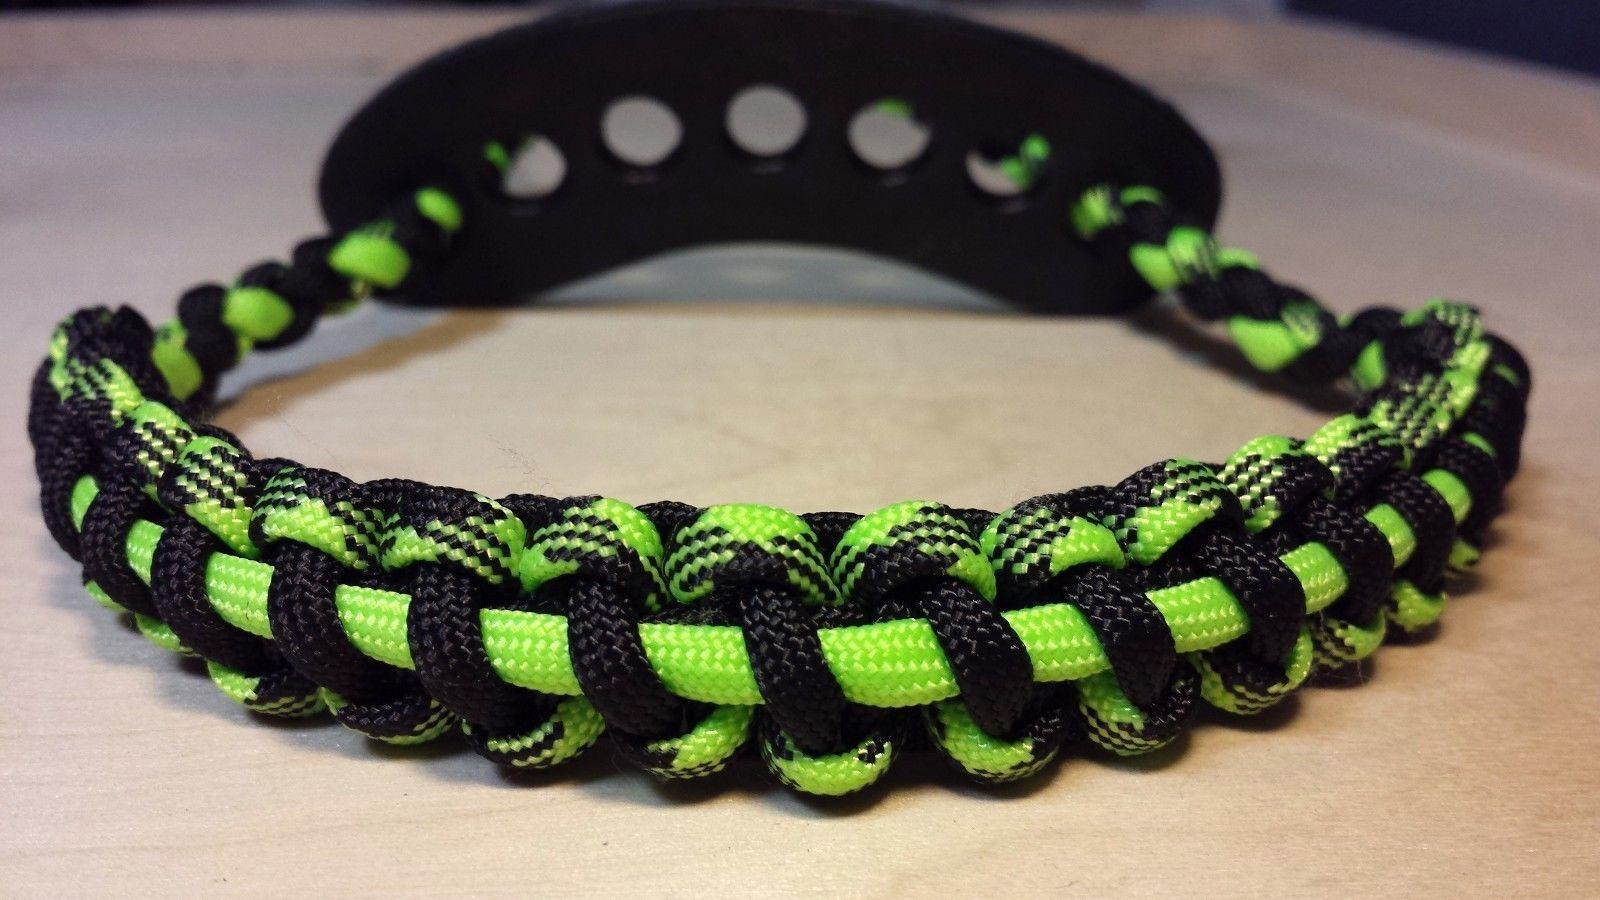 Sporting Goods archery bow wrist sling Black fits Mathews bowtech hoyt pse Accessories